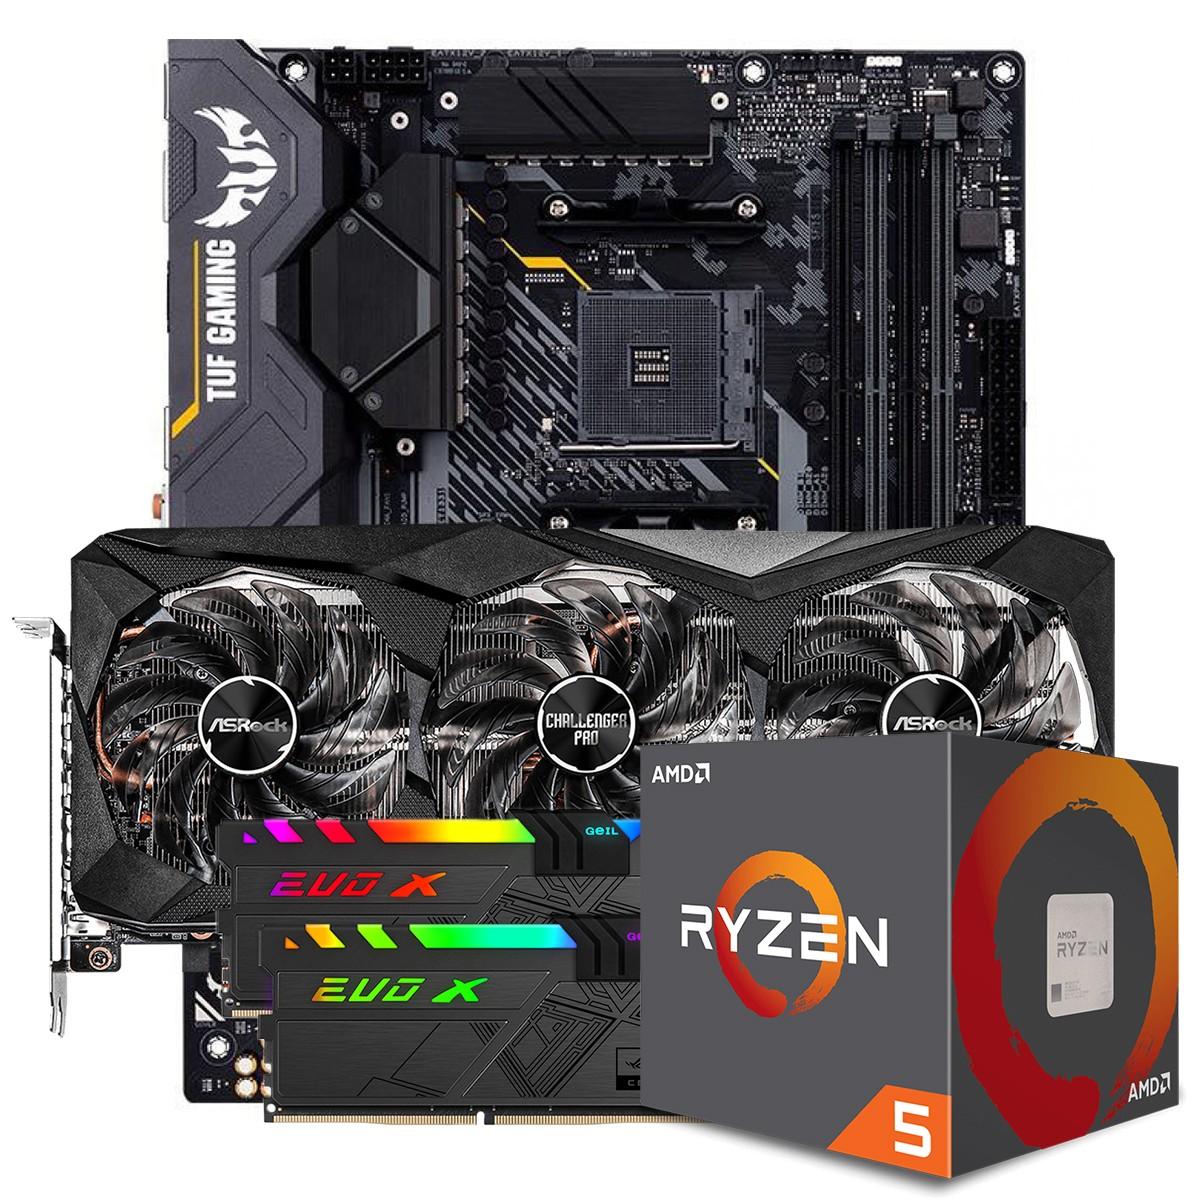 Kit Upgrade ASRock Radeon RX 6700 XT Challenger Pro OC + AMD Ryzen 5 5600X + ASUS TUF Gaming X570-Plus + Memória DDR4 16GB (2x8GB) 3600MHz